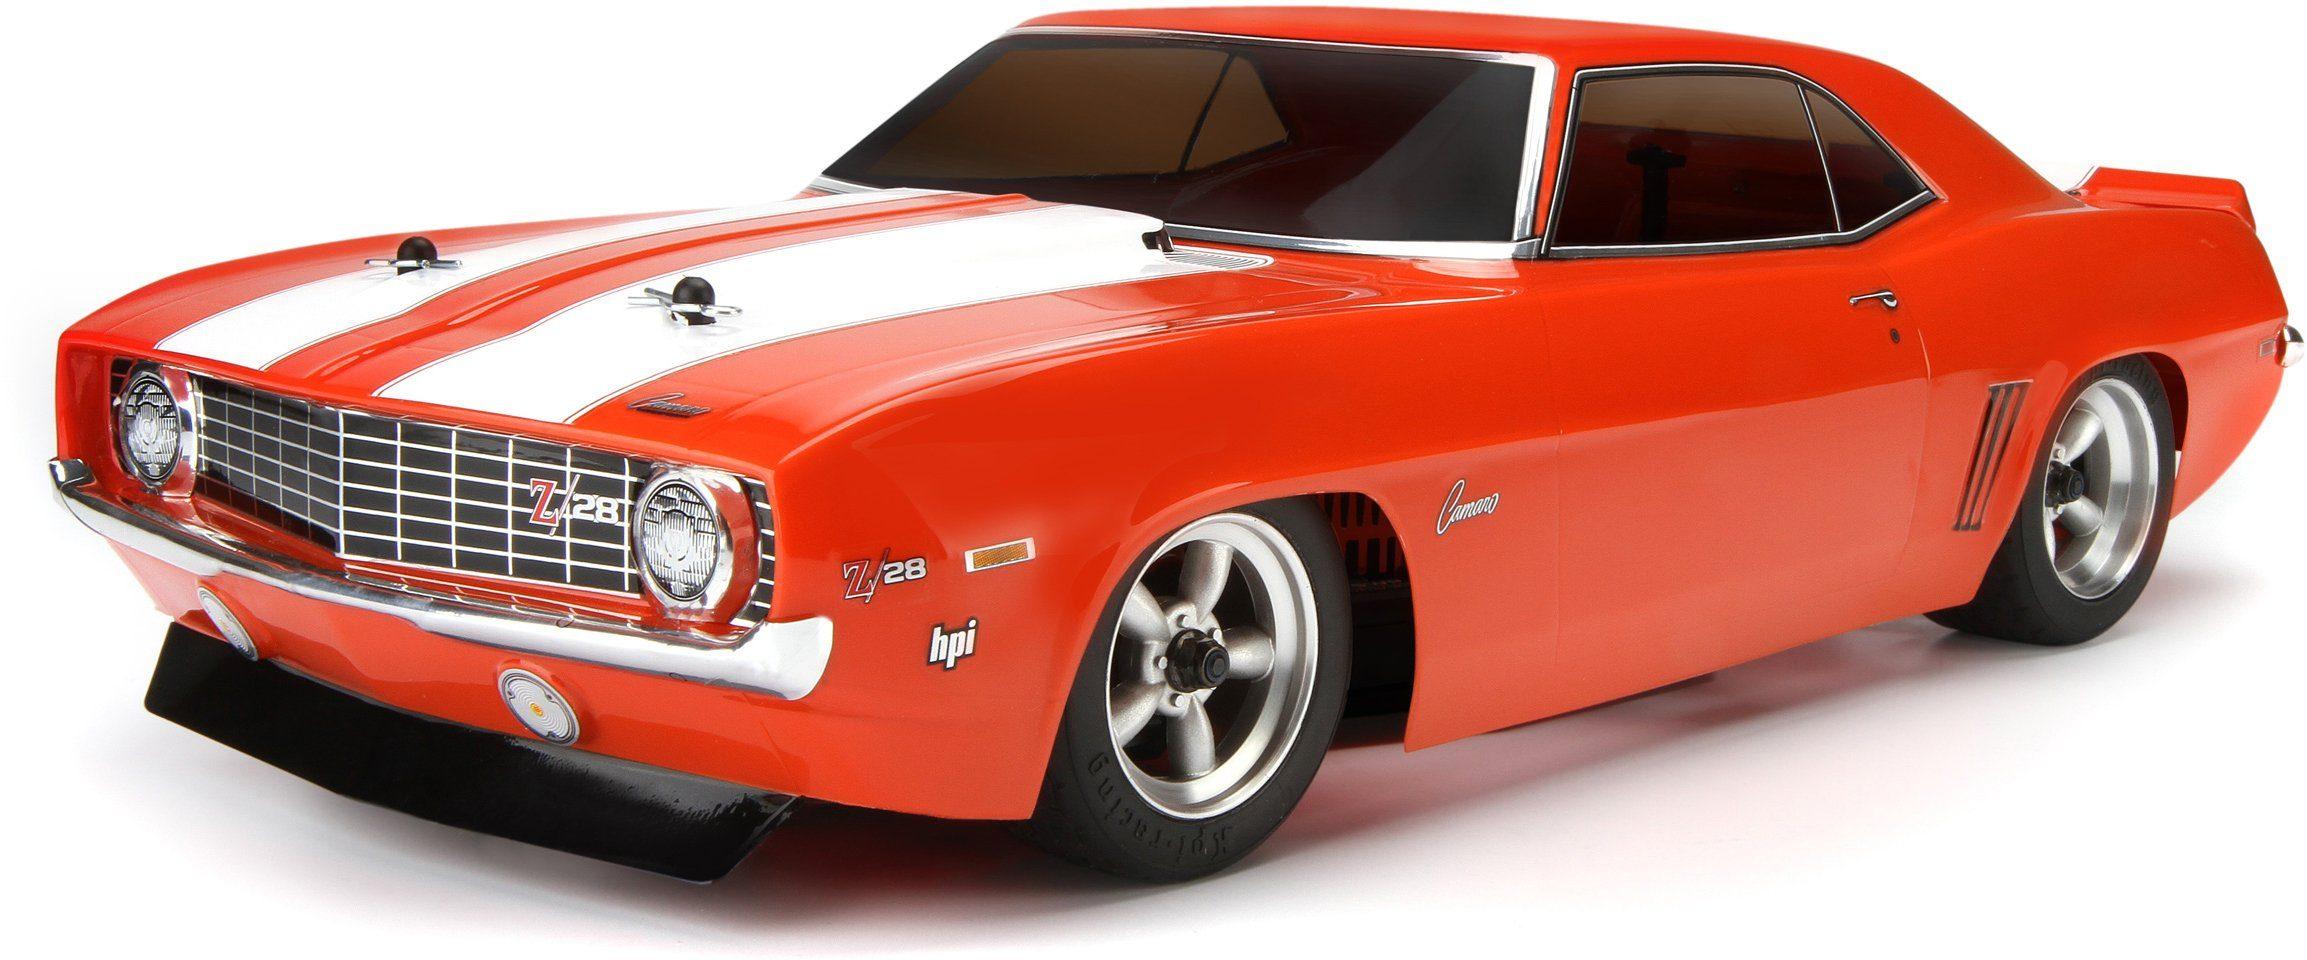 HPI Racing RC Komplettset, »Sprint 2 Sport 1969 Chevrolet Camaro 2,4 GHz 1:10«